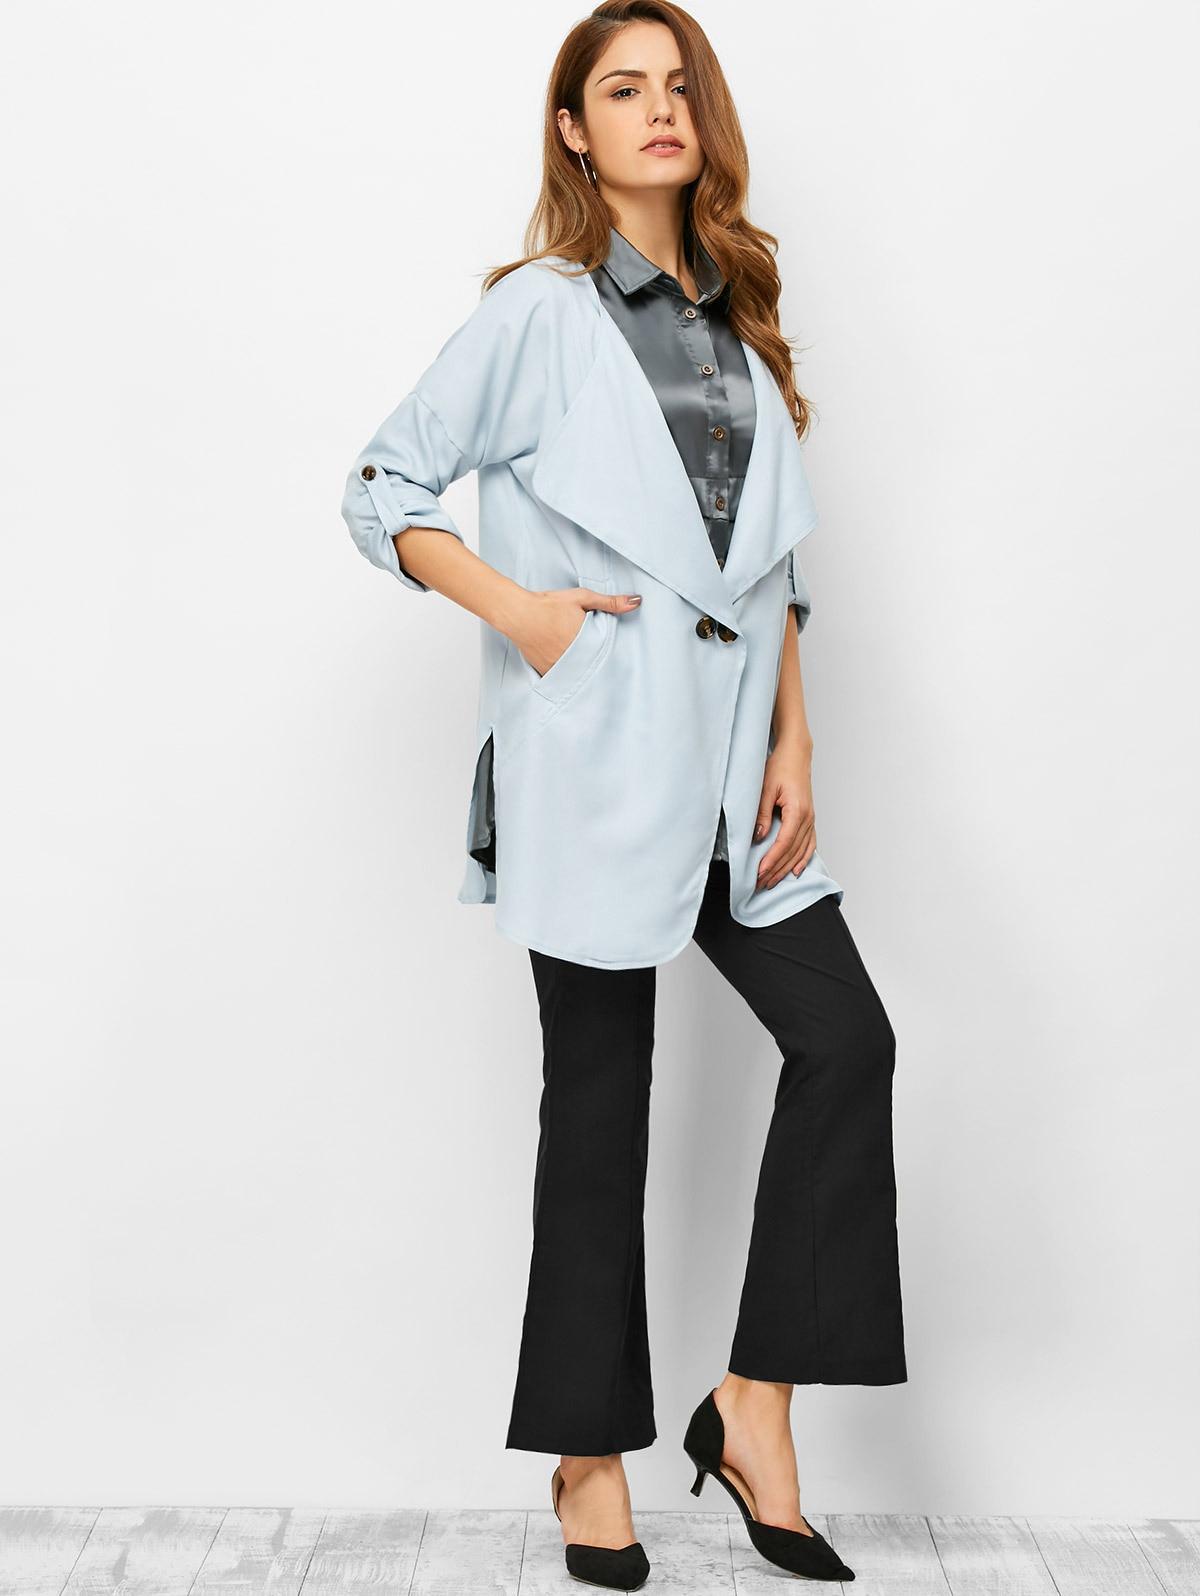 1 Pcs Fashion Spring Autumn Women Khaki Blue Pure Color Linen Long Single Button Windbreaker Jacket  Thin Coat Overcoat